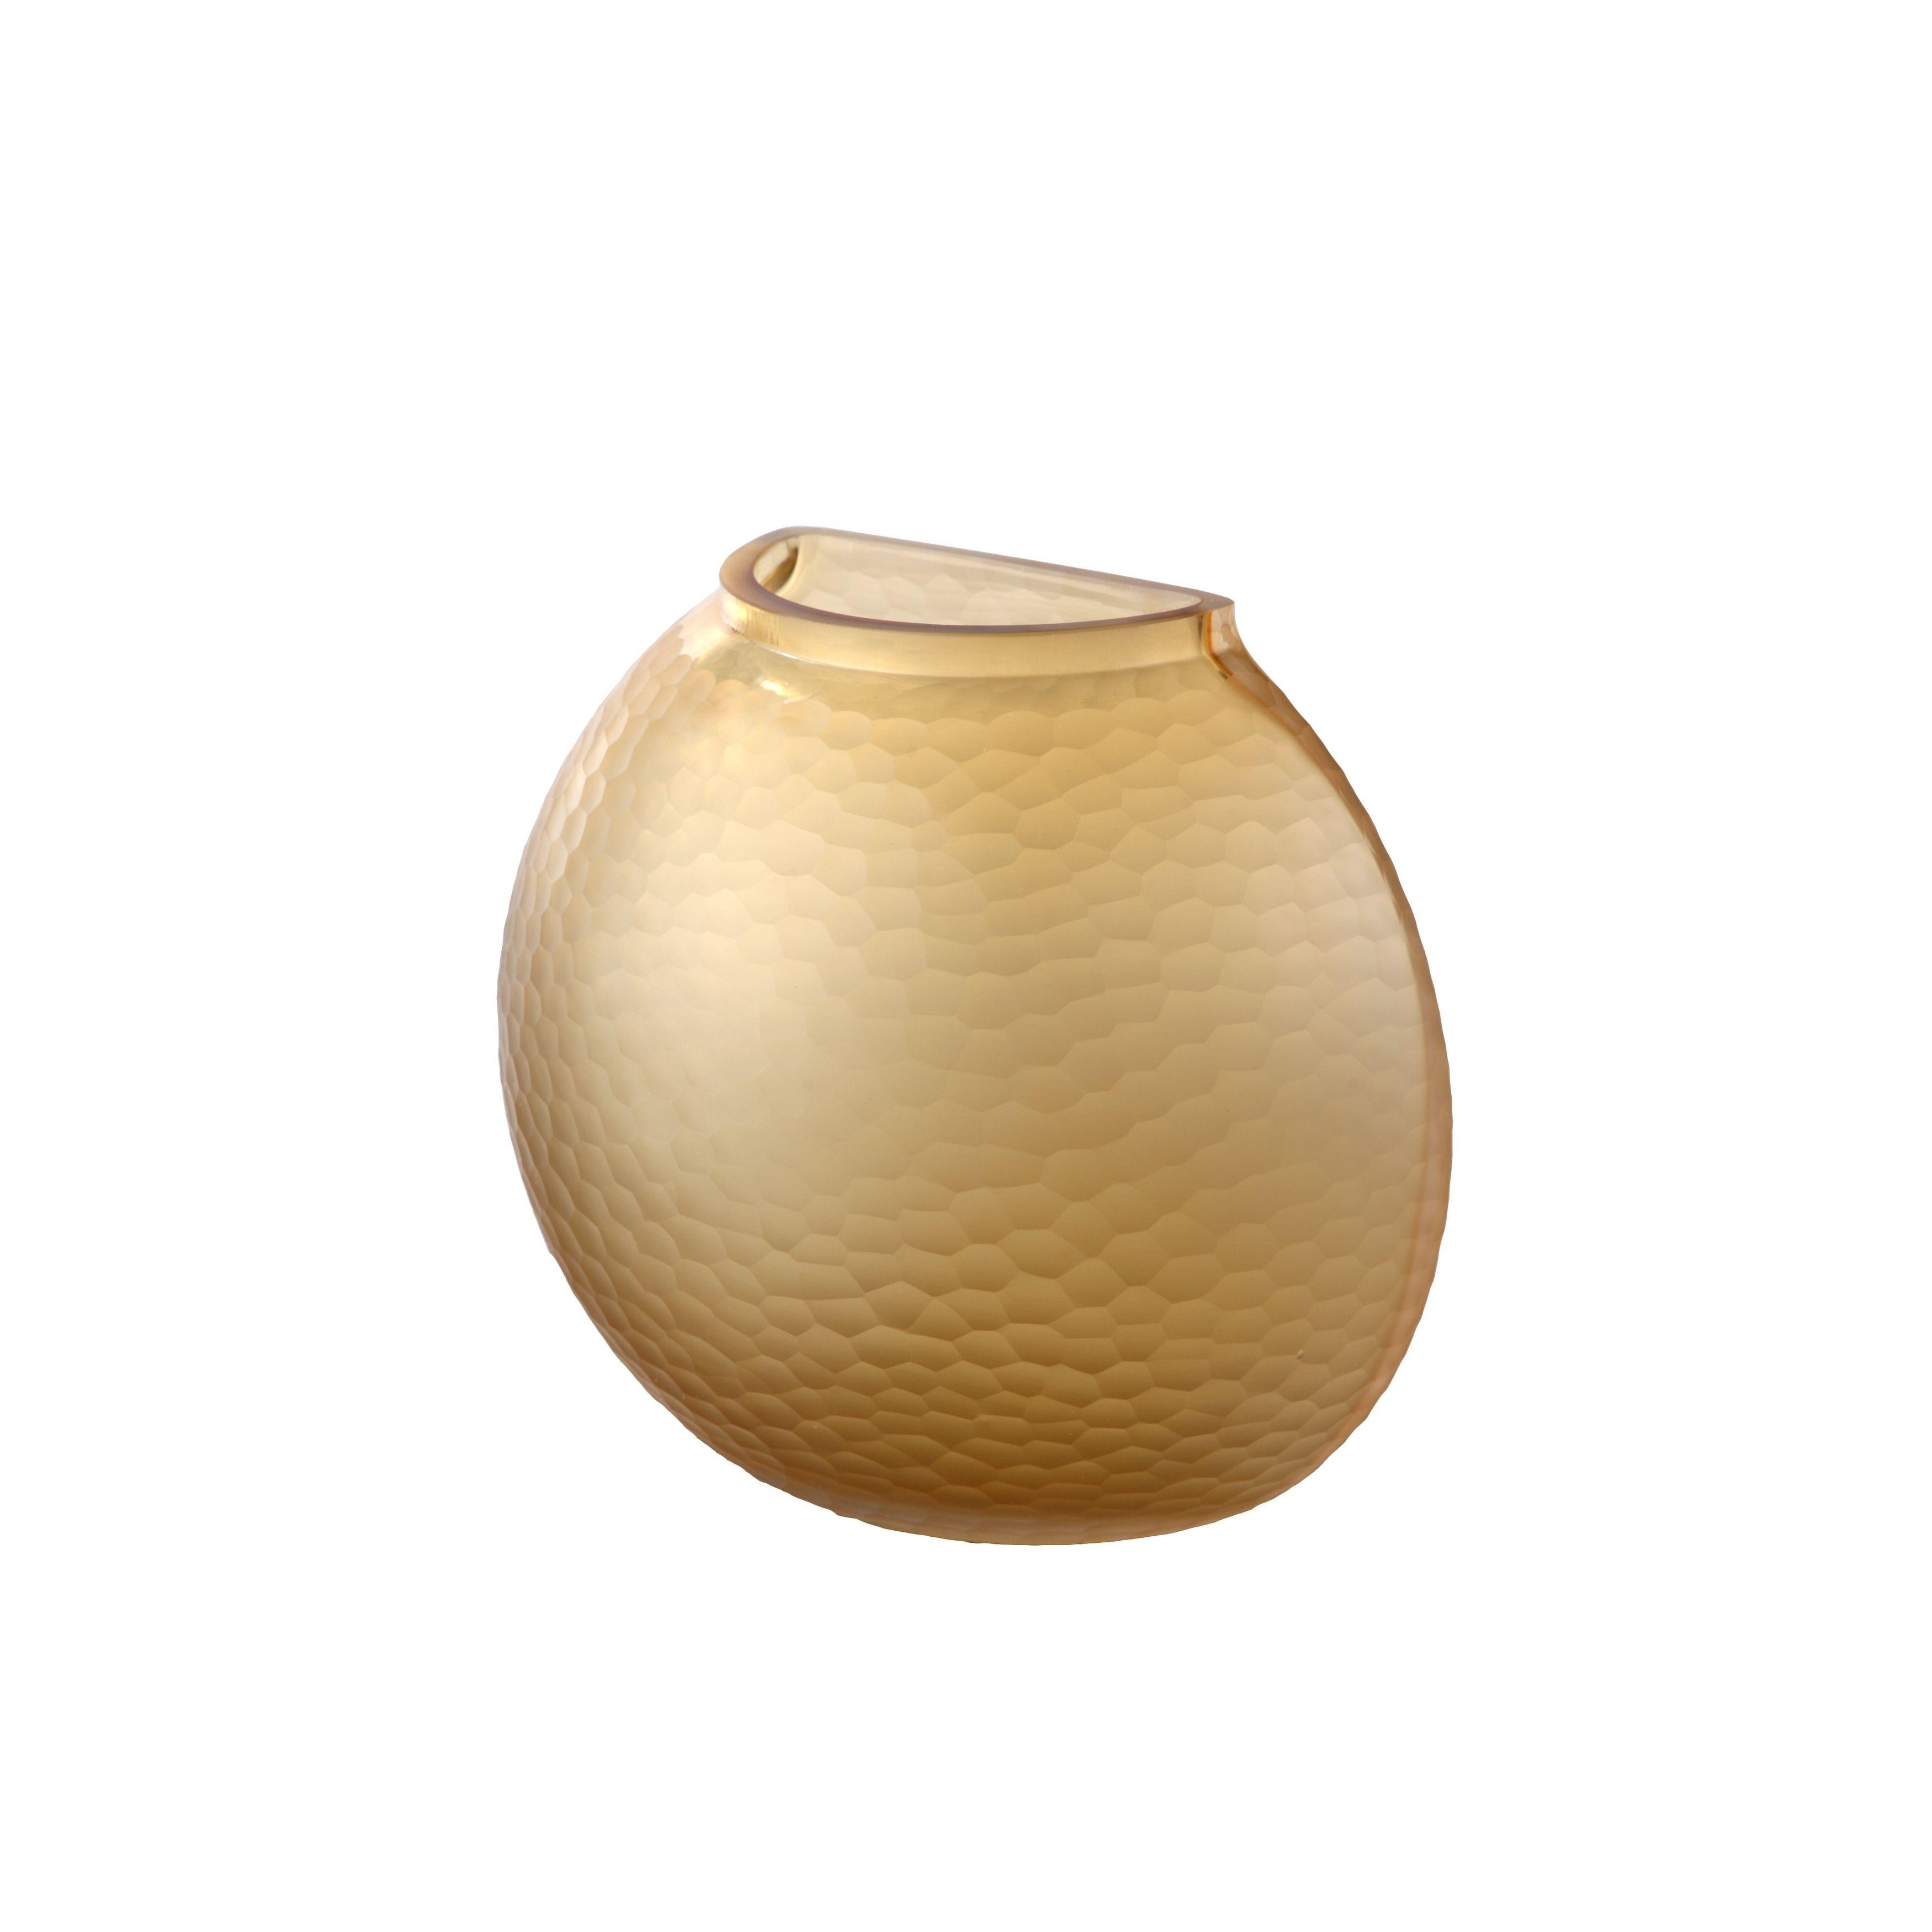 blue sea glass vase of aurelle home form glass vase blue size medium 8 15 medium 8 pertaining to aurelle home form glass vase orange size medium 8 15